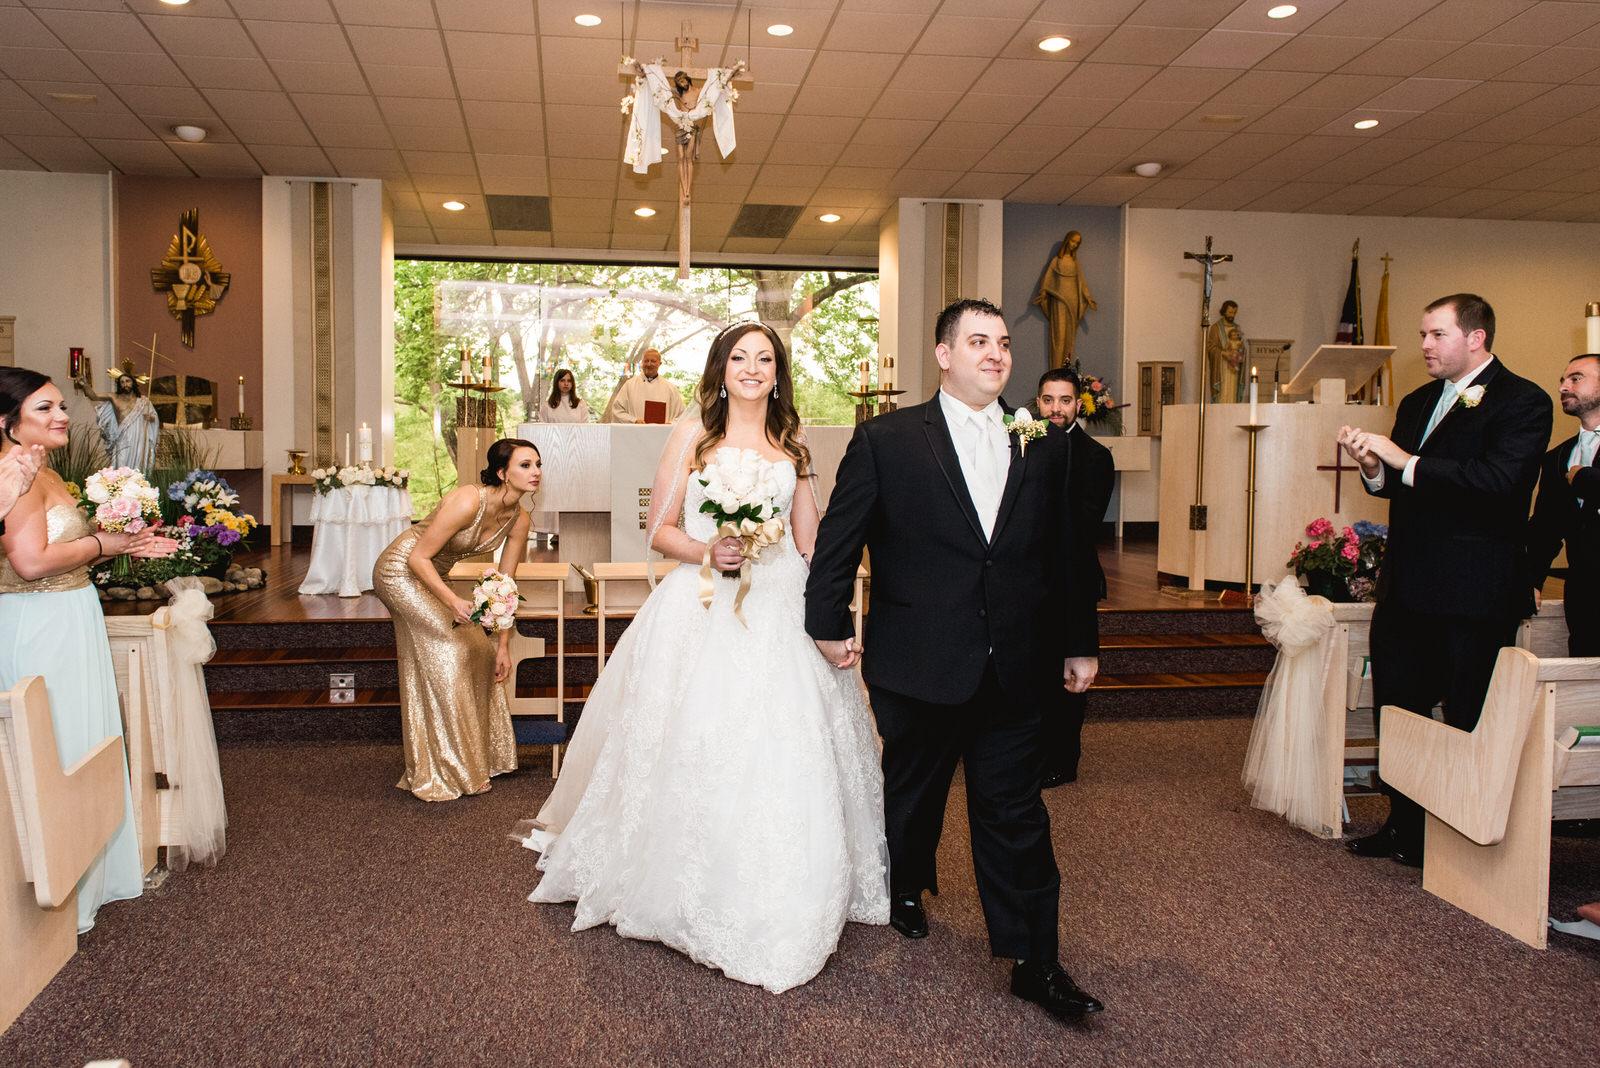 Laube_Banquet_Hall__Wedding_Photos_049.jpg